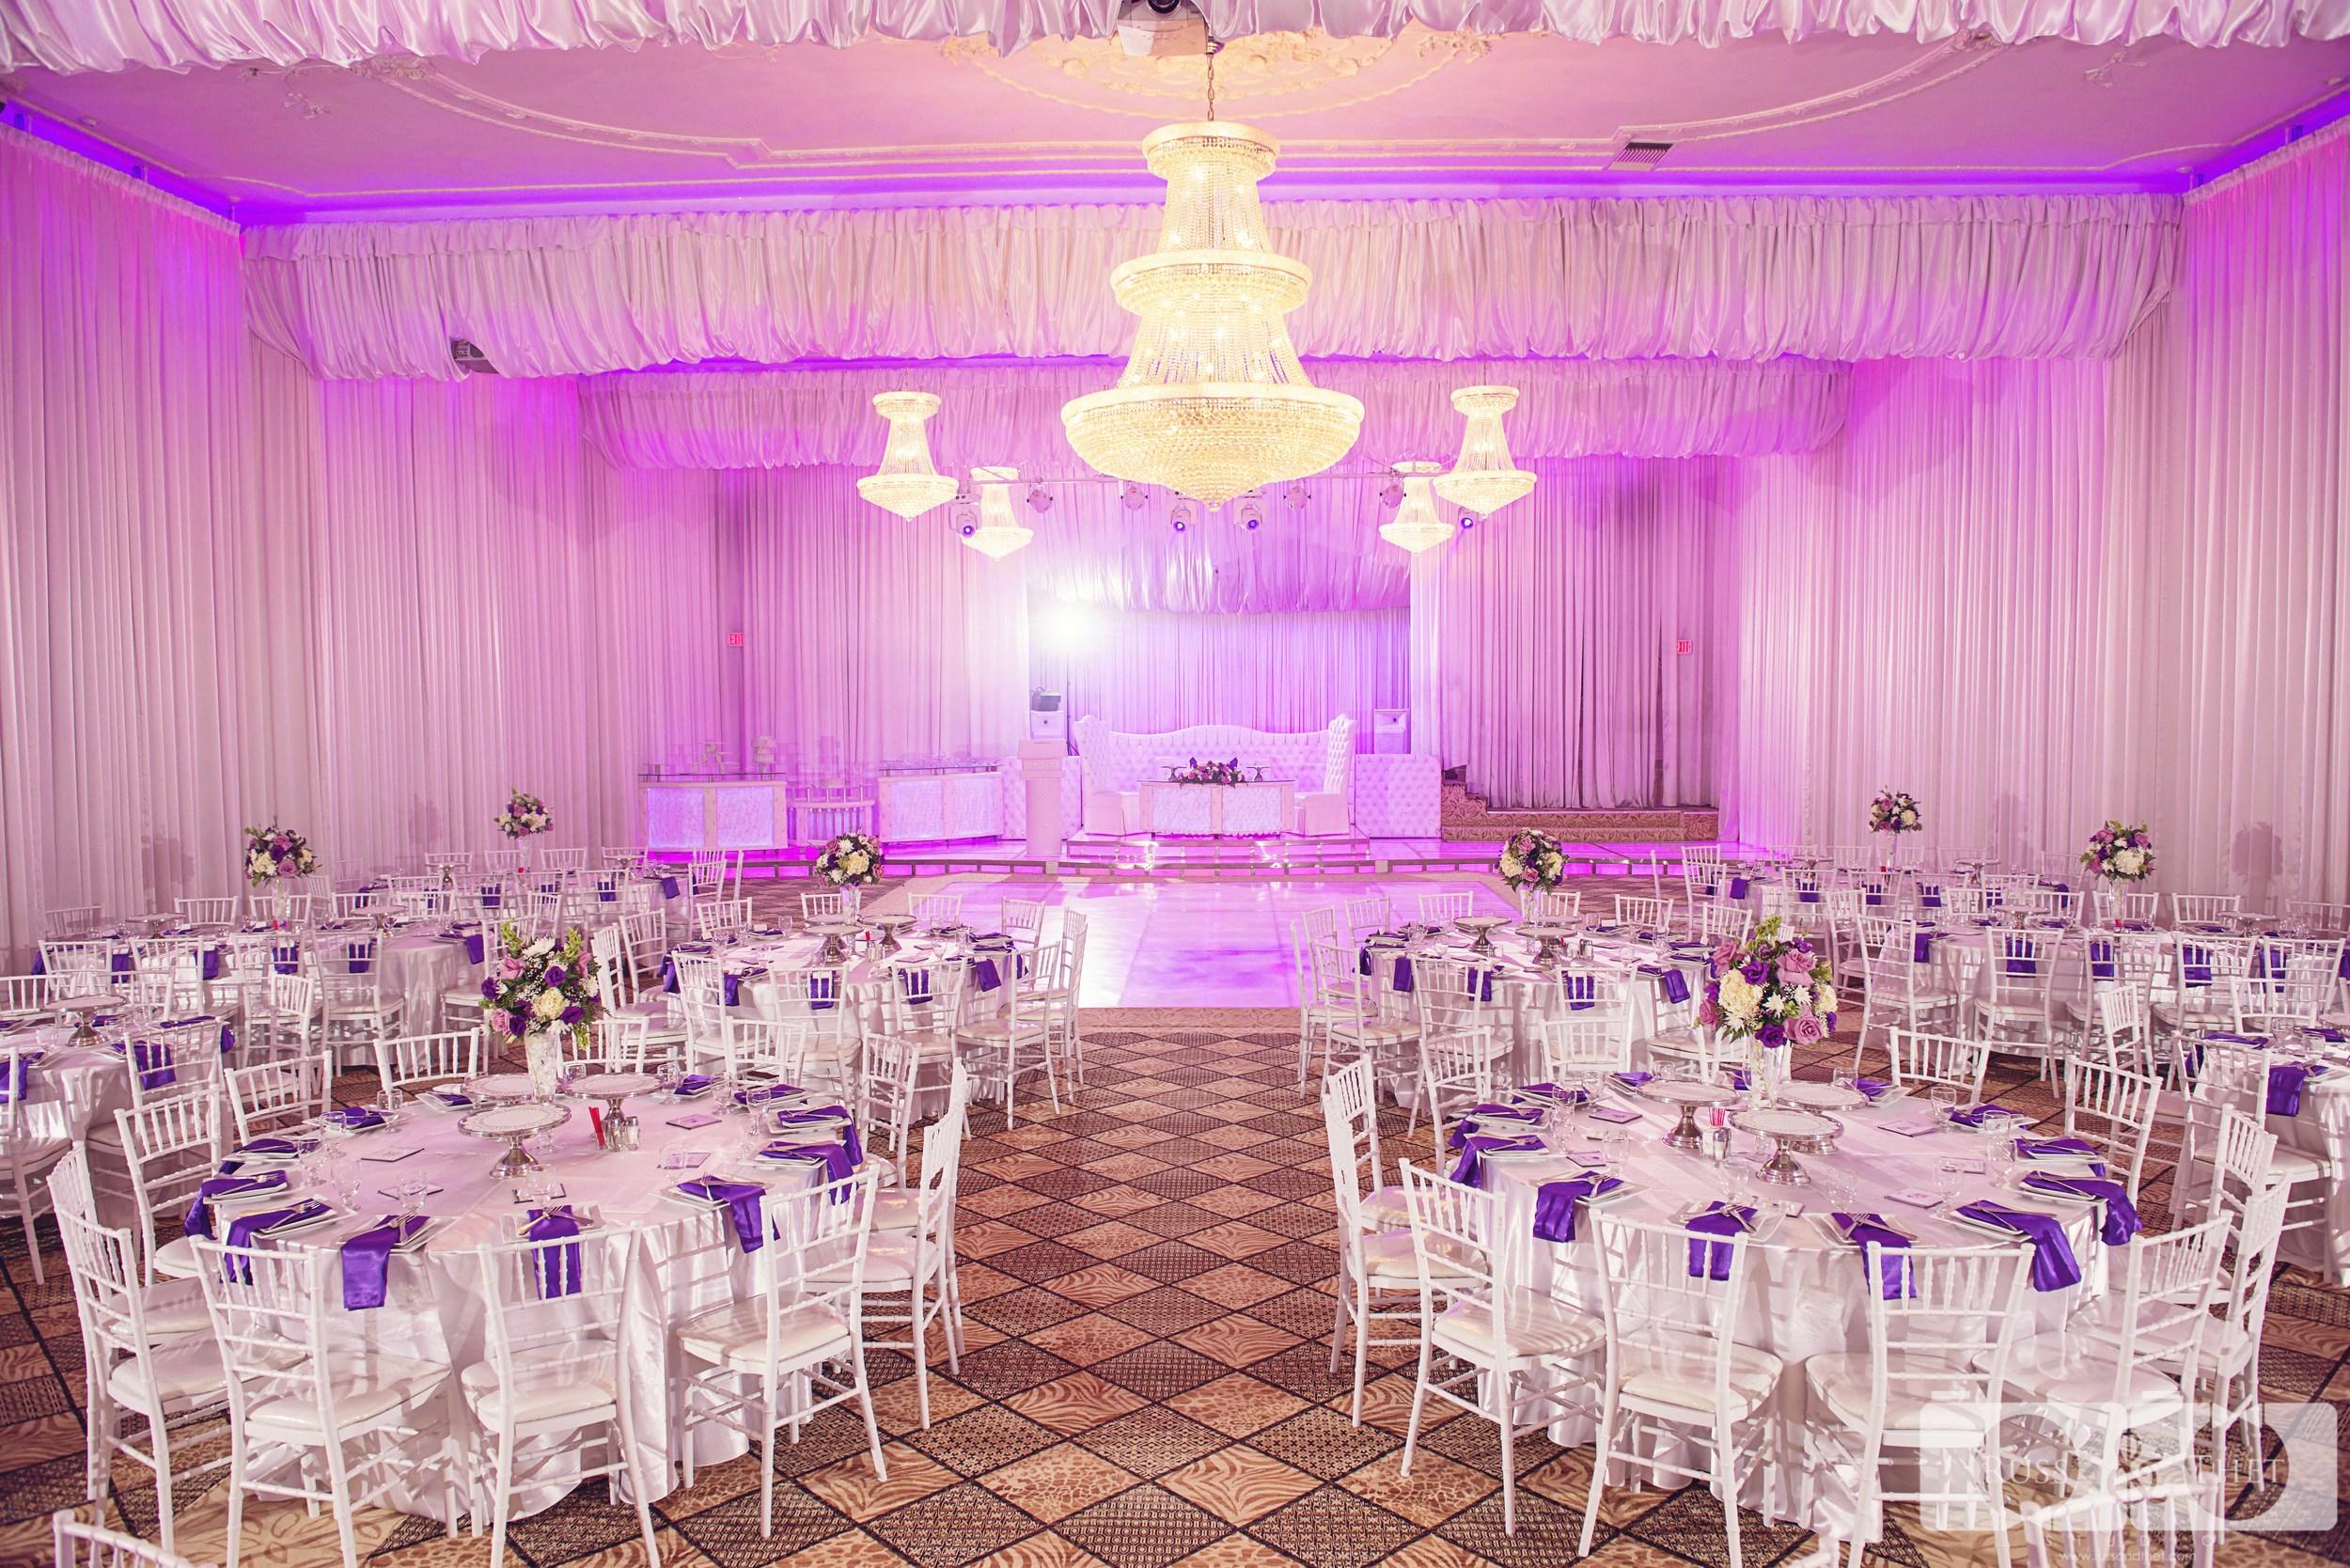 royal-palace-banquet-hall-glendale-wedding-15.JPG